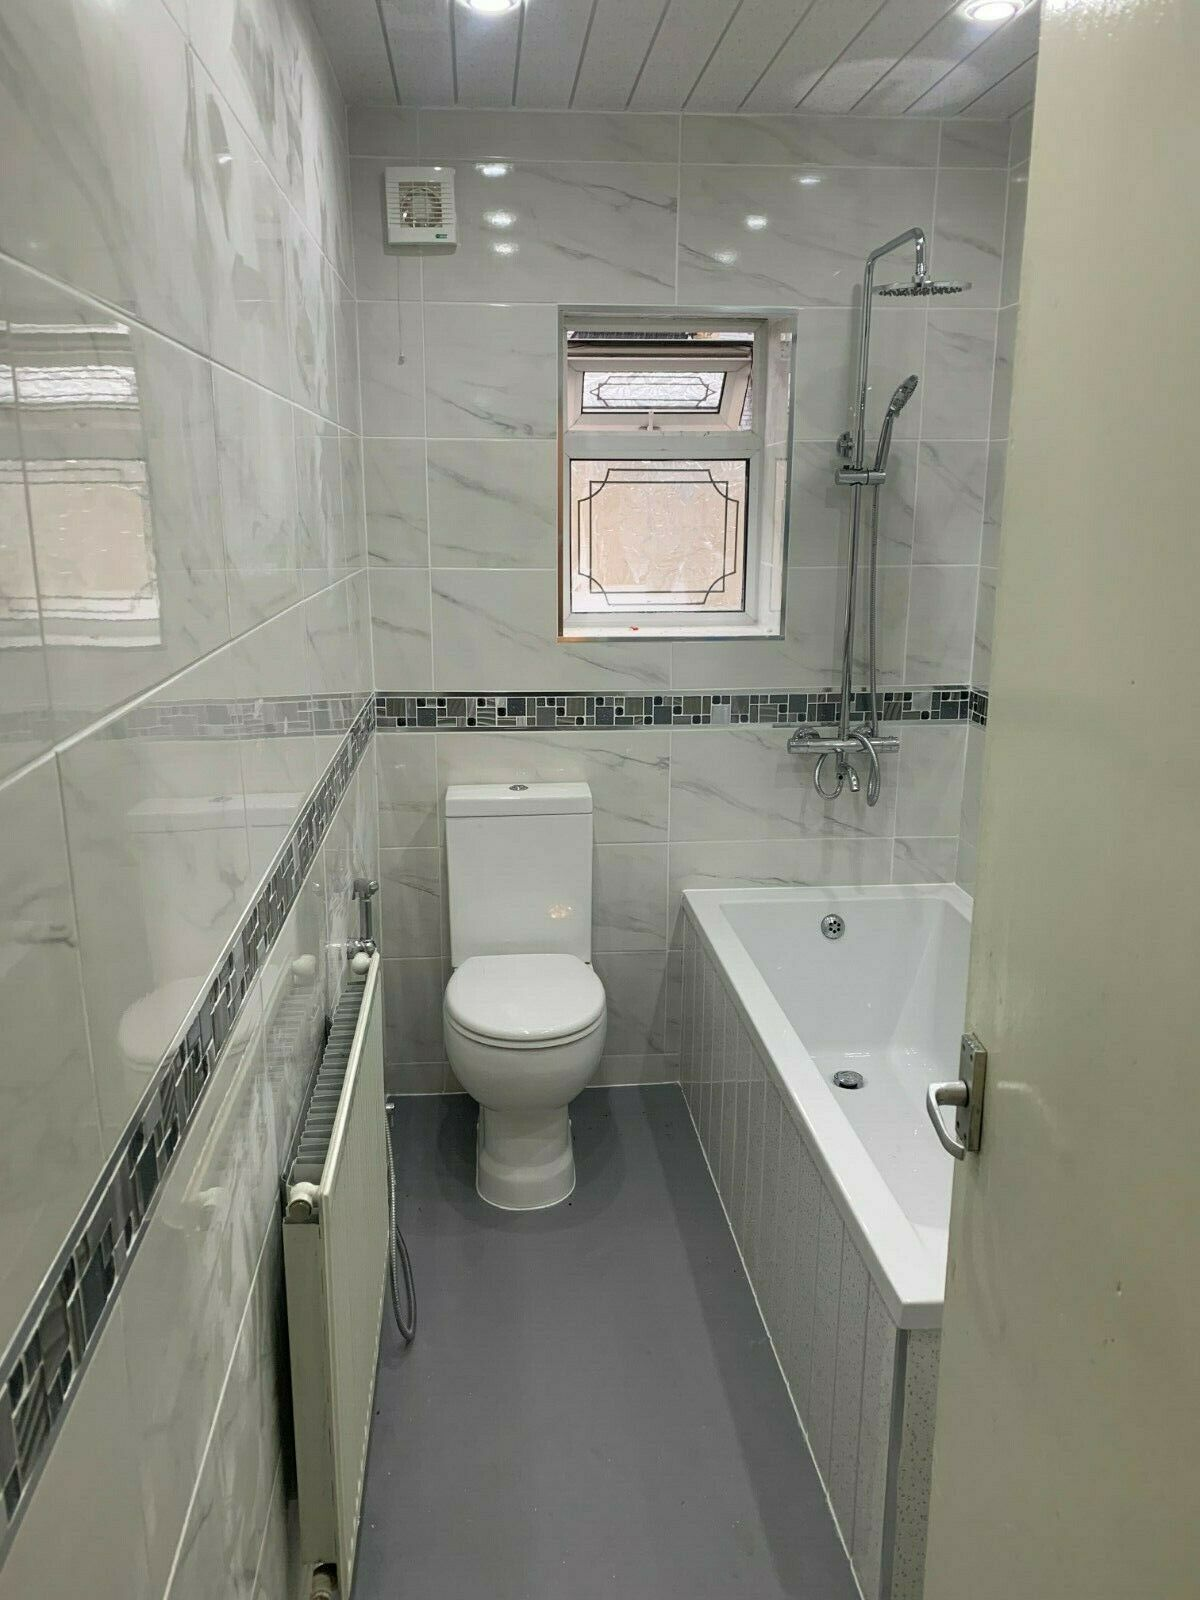 Mármol blancoo Kalala fotónico 30x60 clase AAA azulejos de 20 metros cuadrados